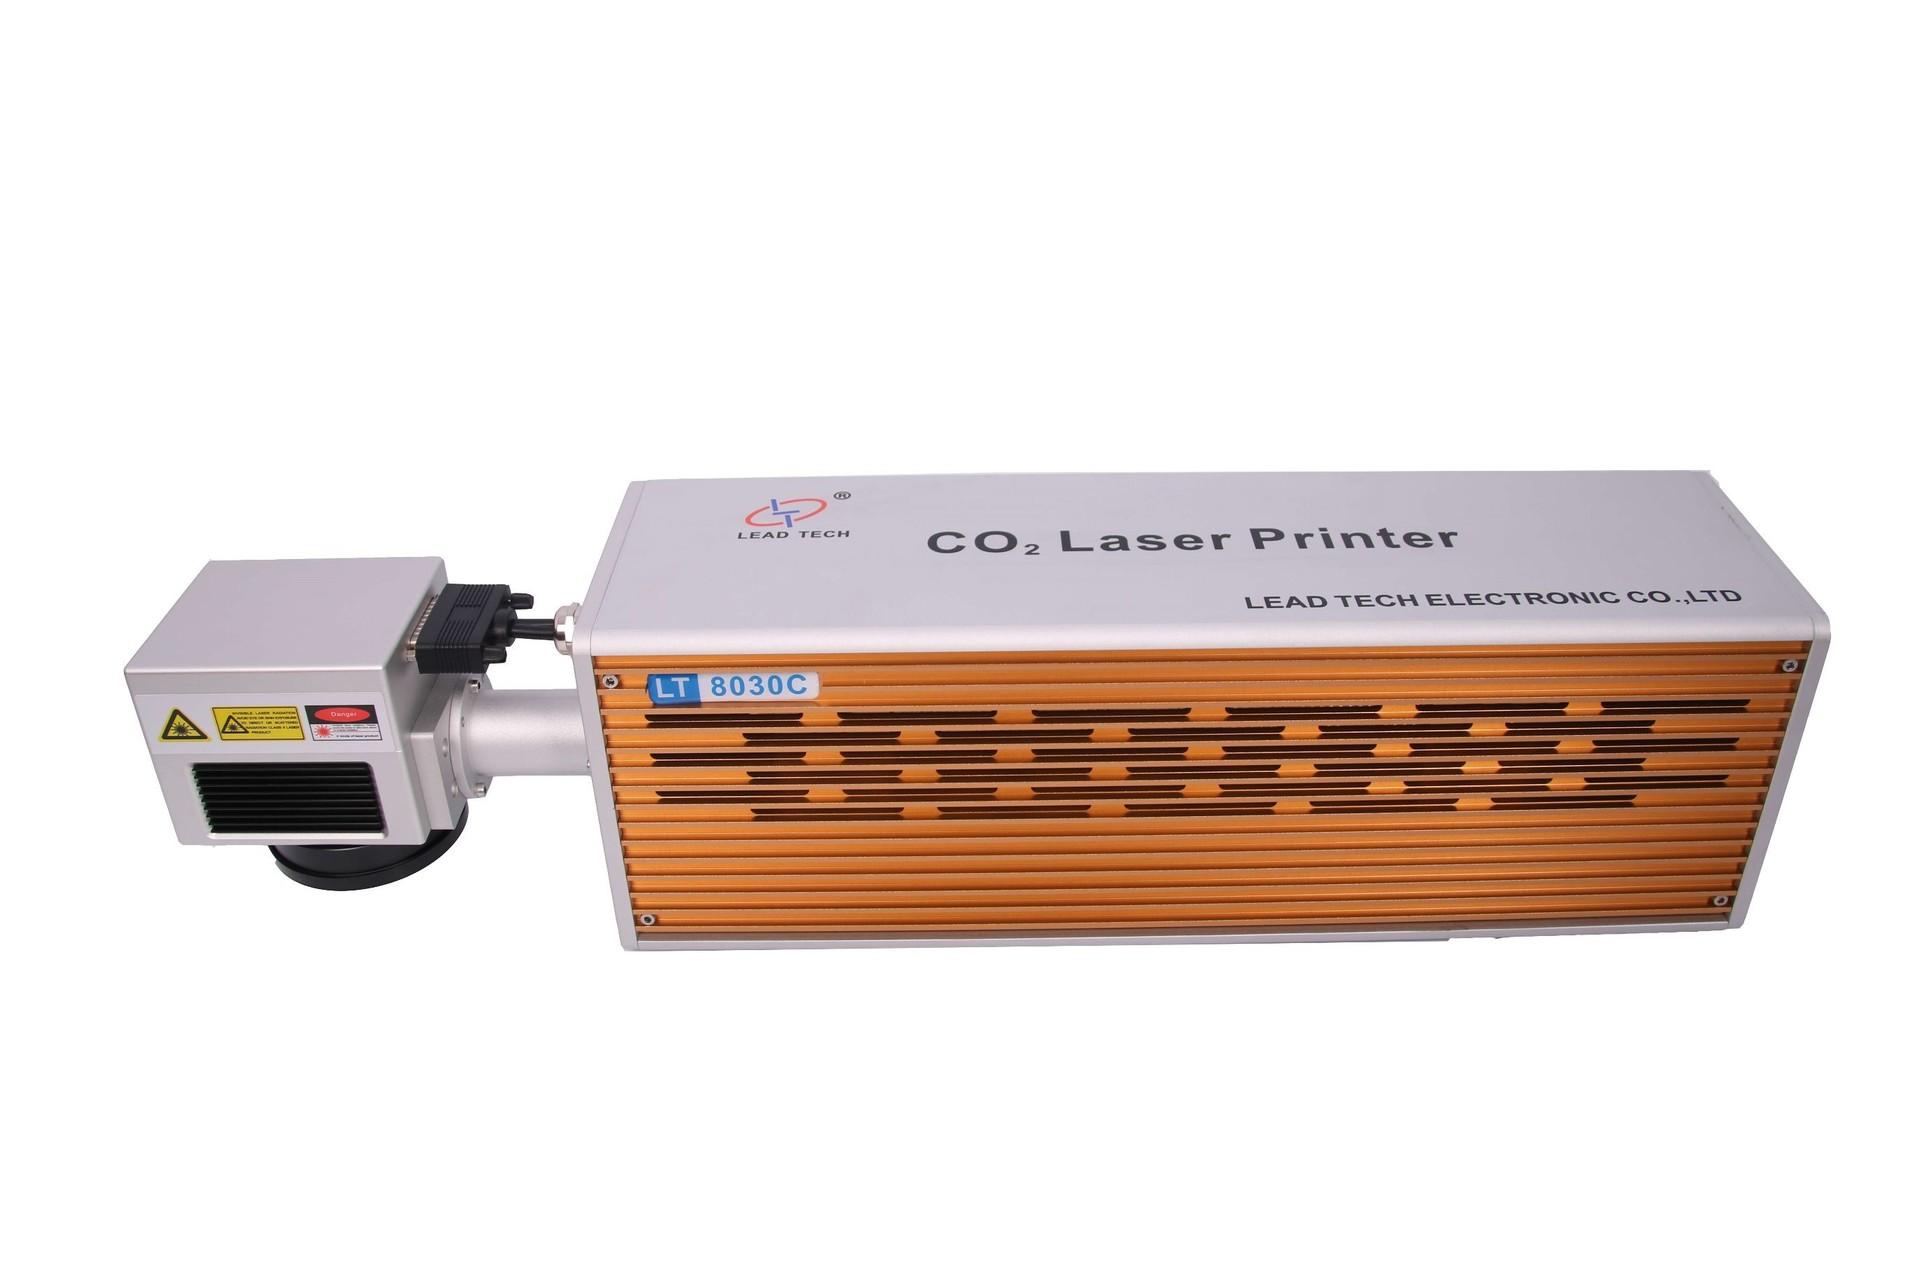 Lt8020c/Lt8030c CO2 High Performance Digital Laser Marking Printer for Plate Silver Gold Printing